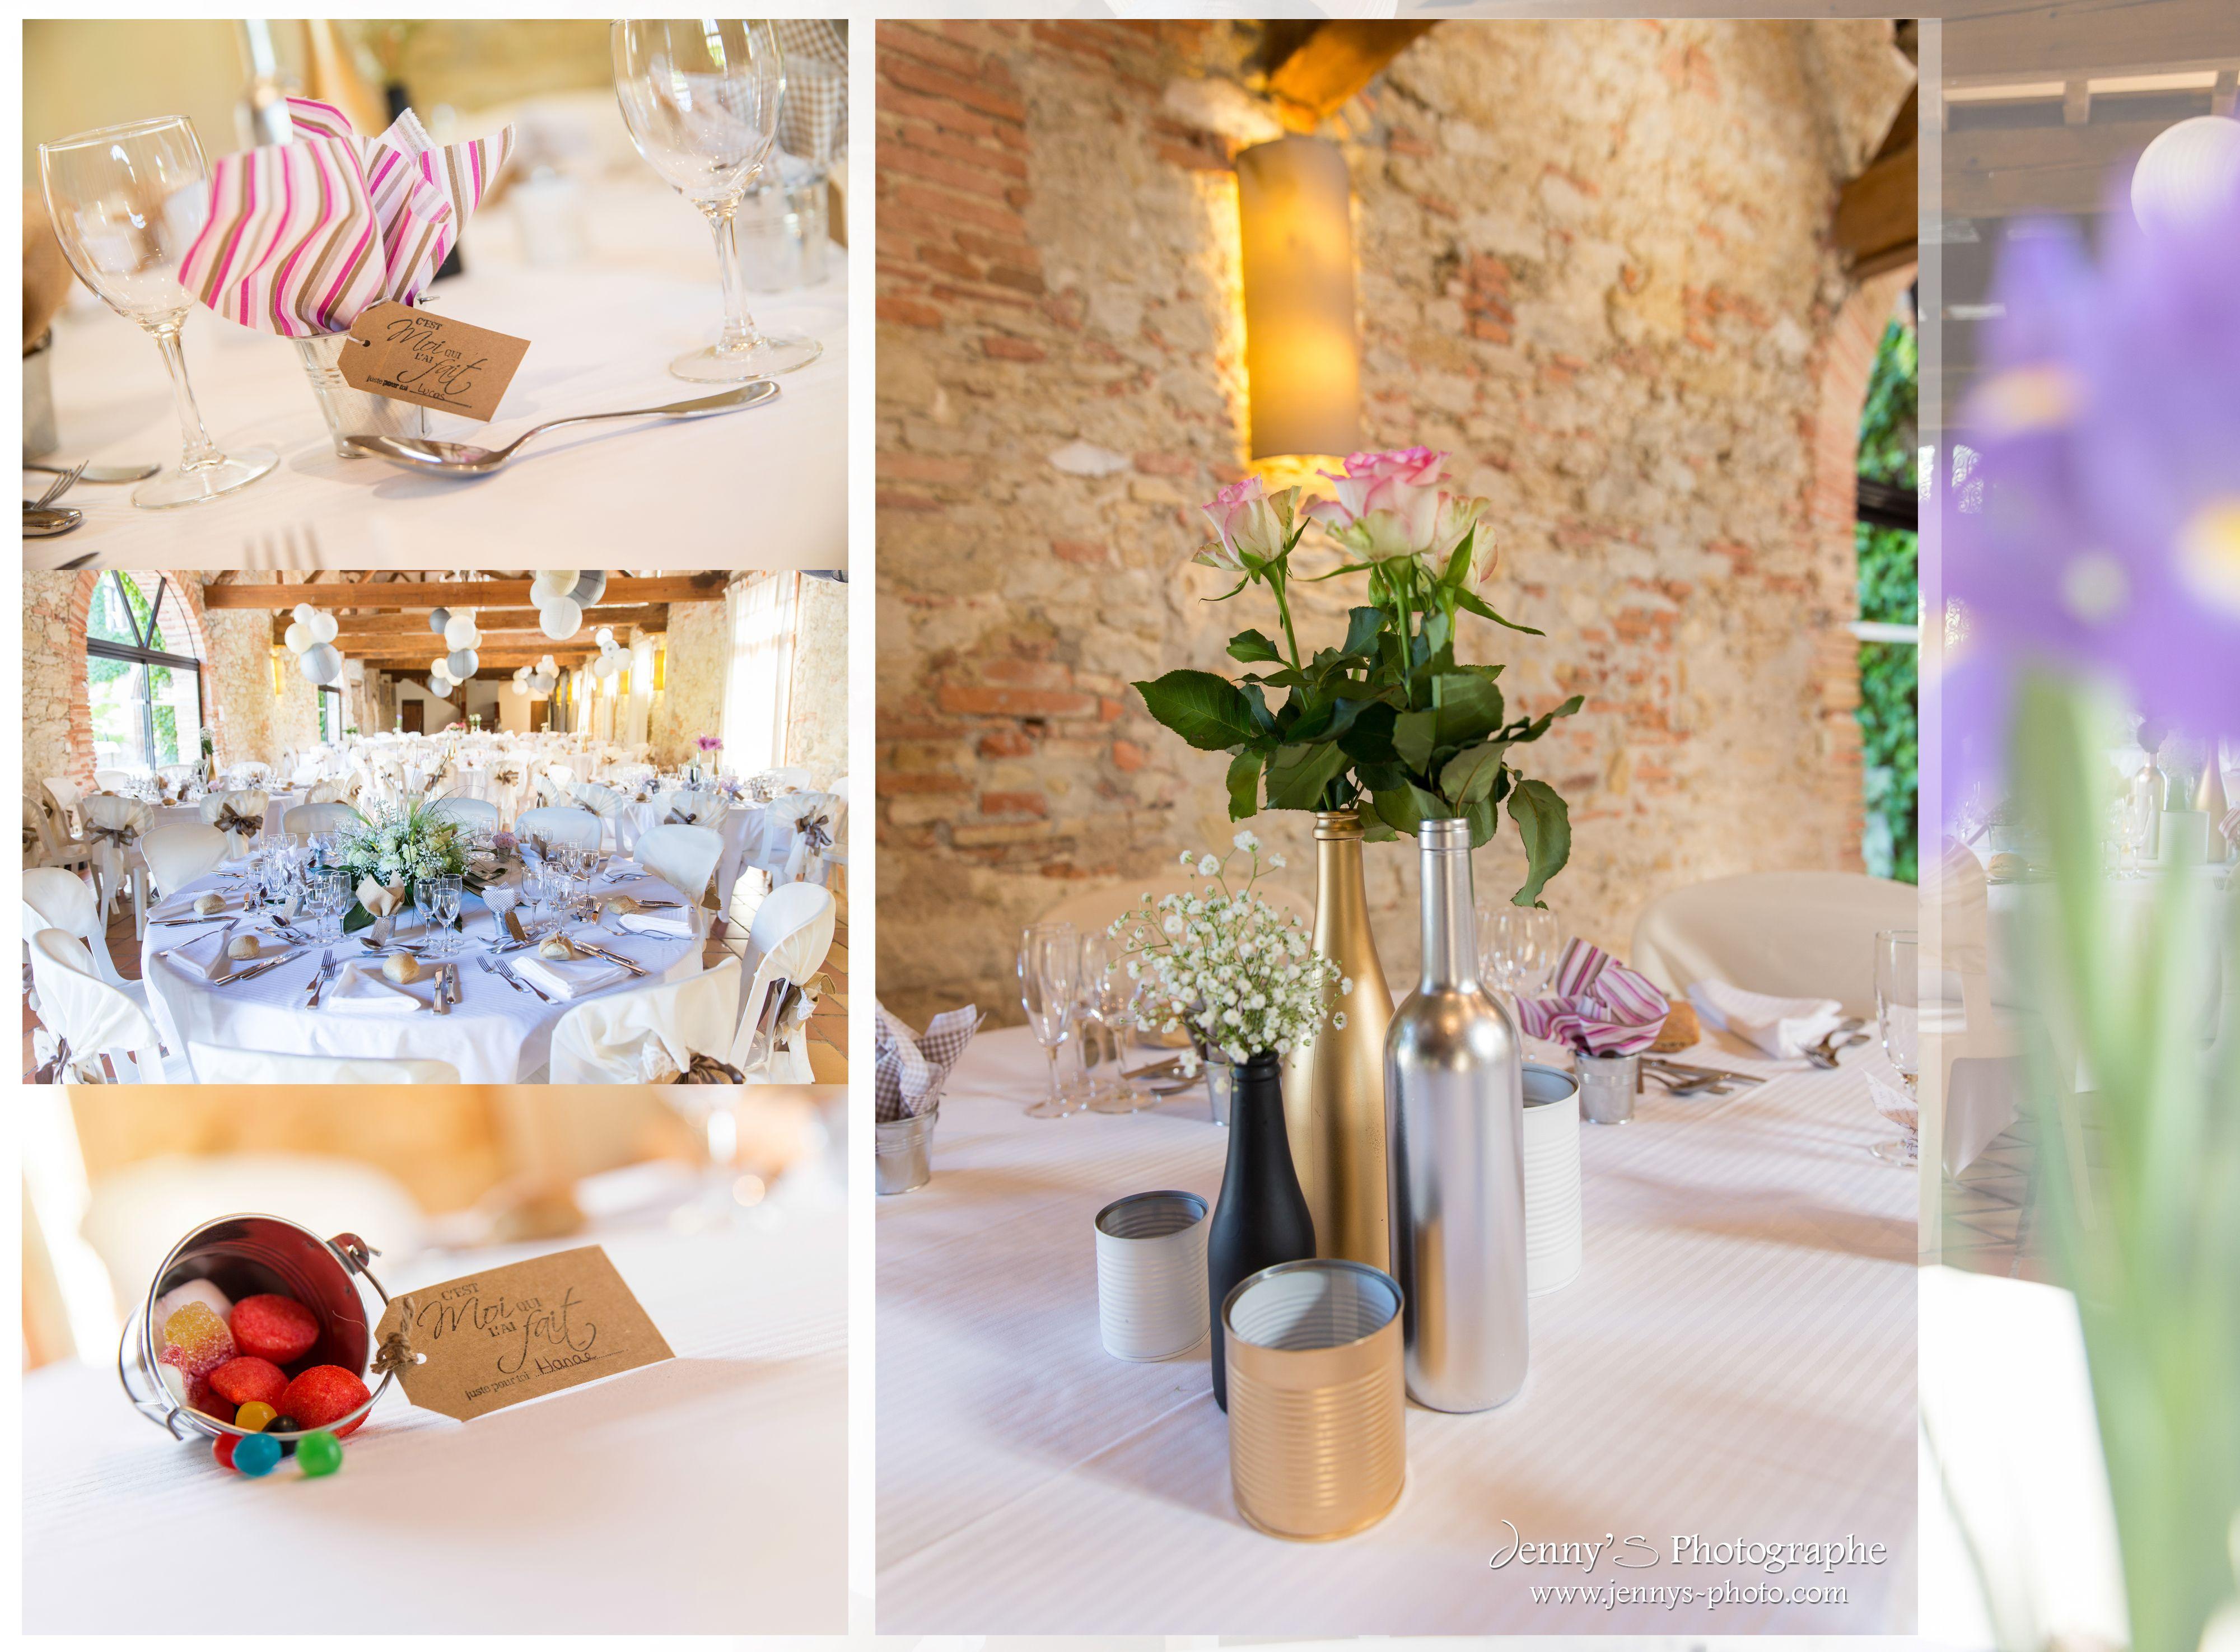 d coration mariage fleur fraiches noir blanc et dor mariage theme glamour campagne chic. Black Bedroom Furniture Sets. Home Design Ideas